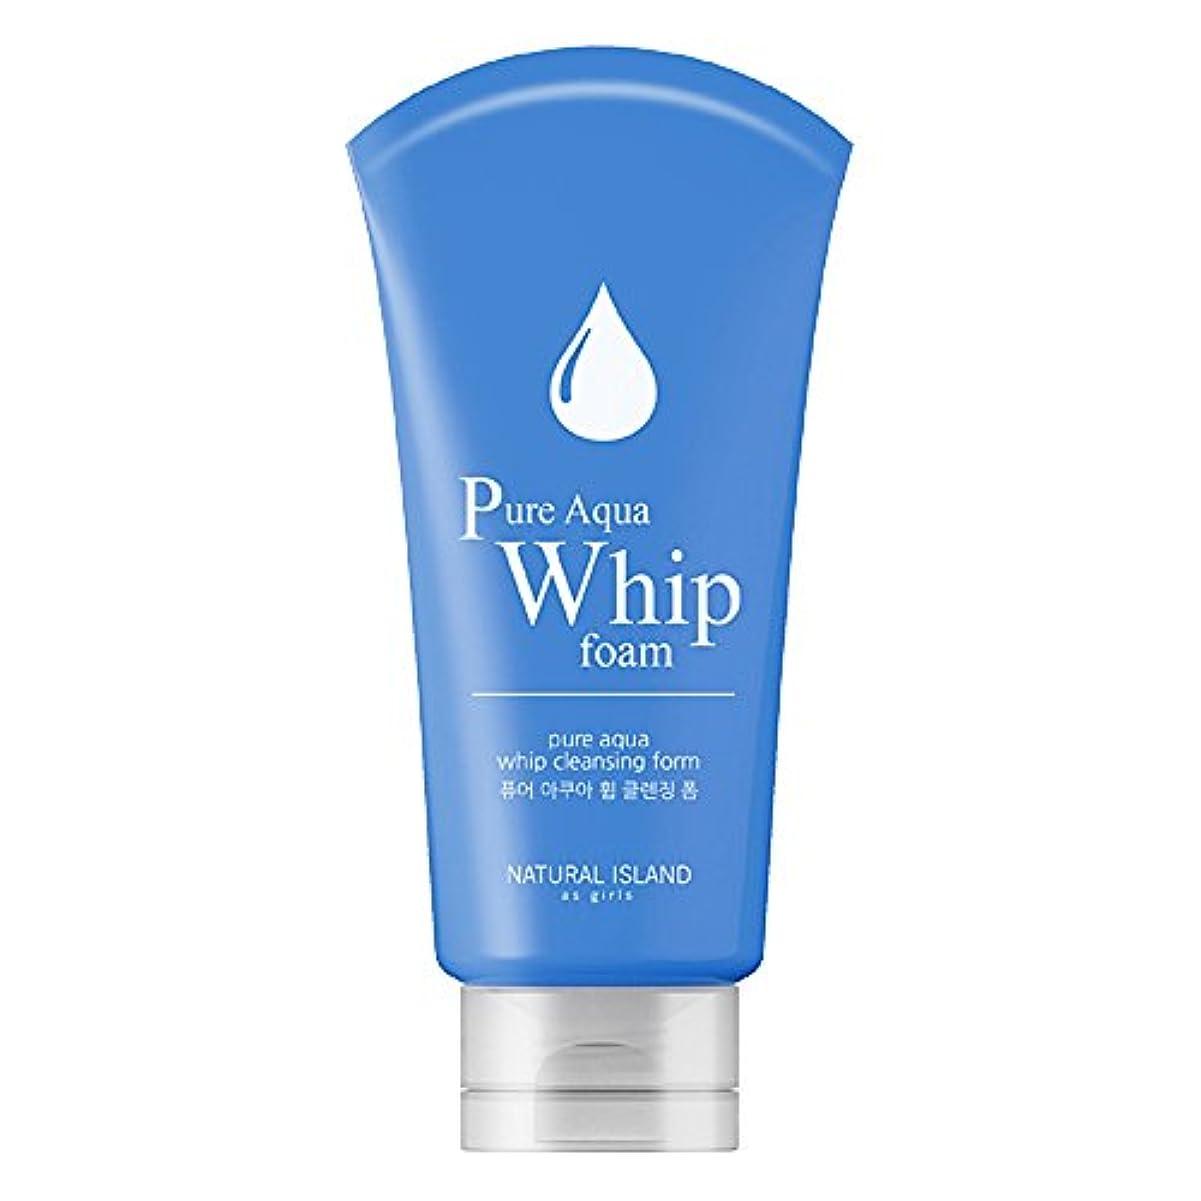 Natural Island Pure Aqua Whip Cleansing Foam 120ml/ナチュラルアイランドピュアアクアホイップクレンジングフォーム120ml [並行輸入品]